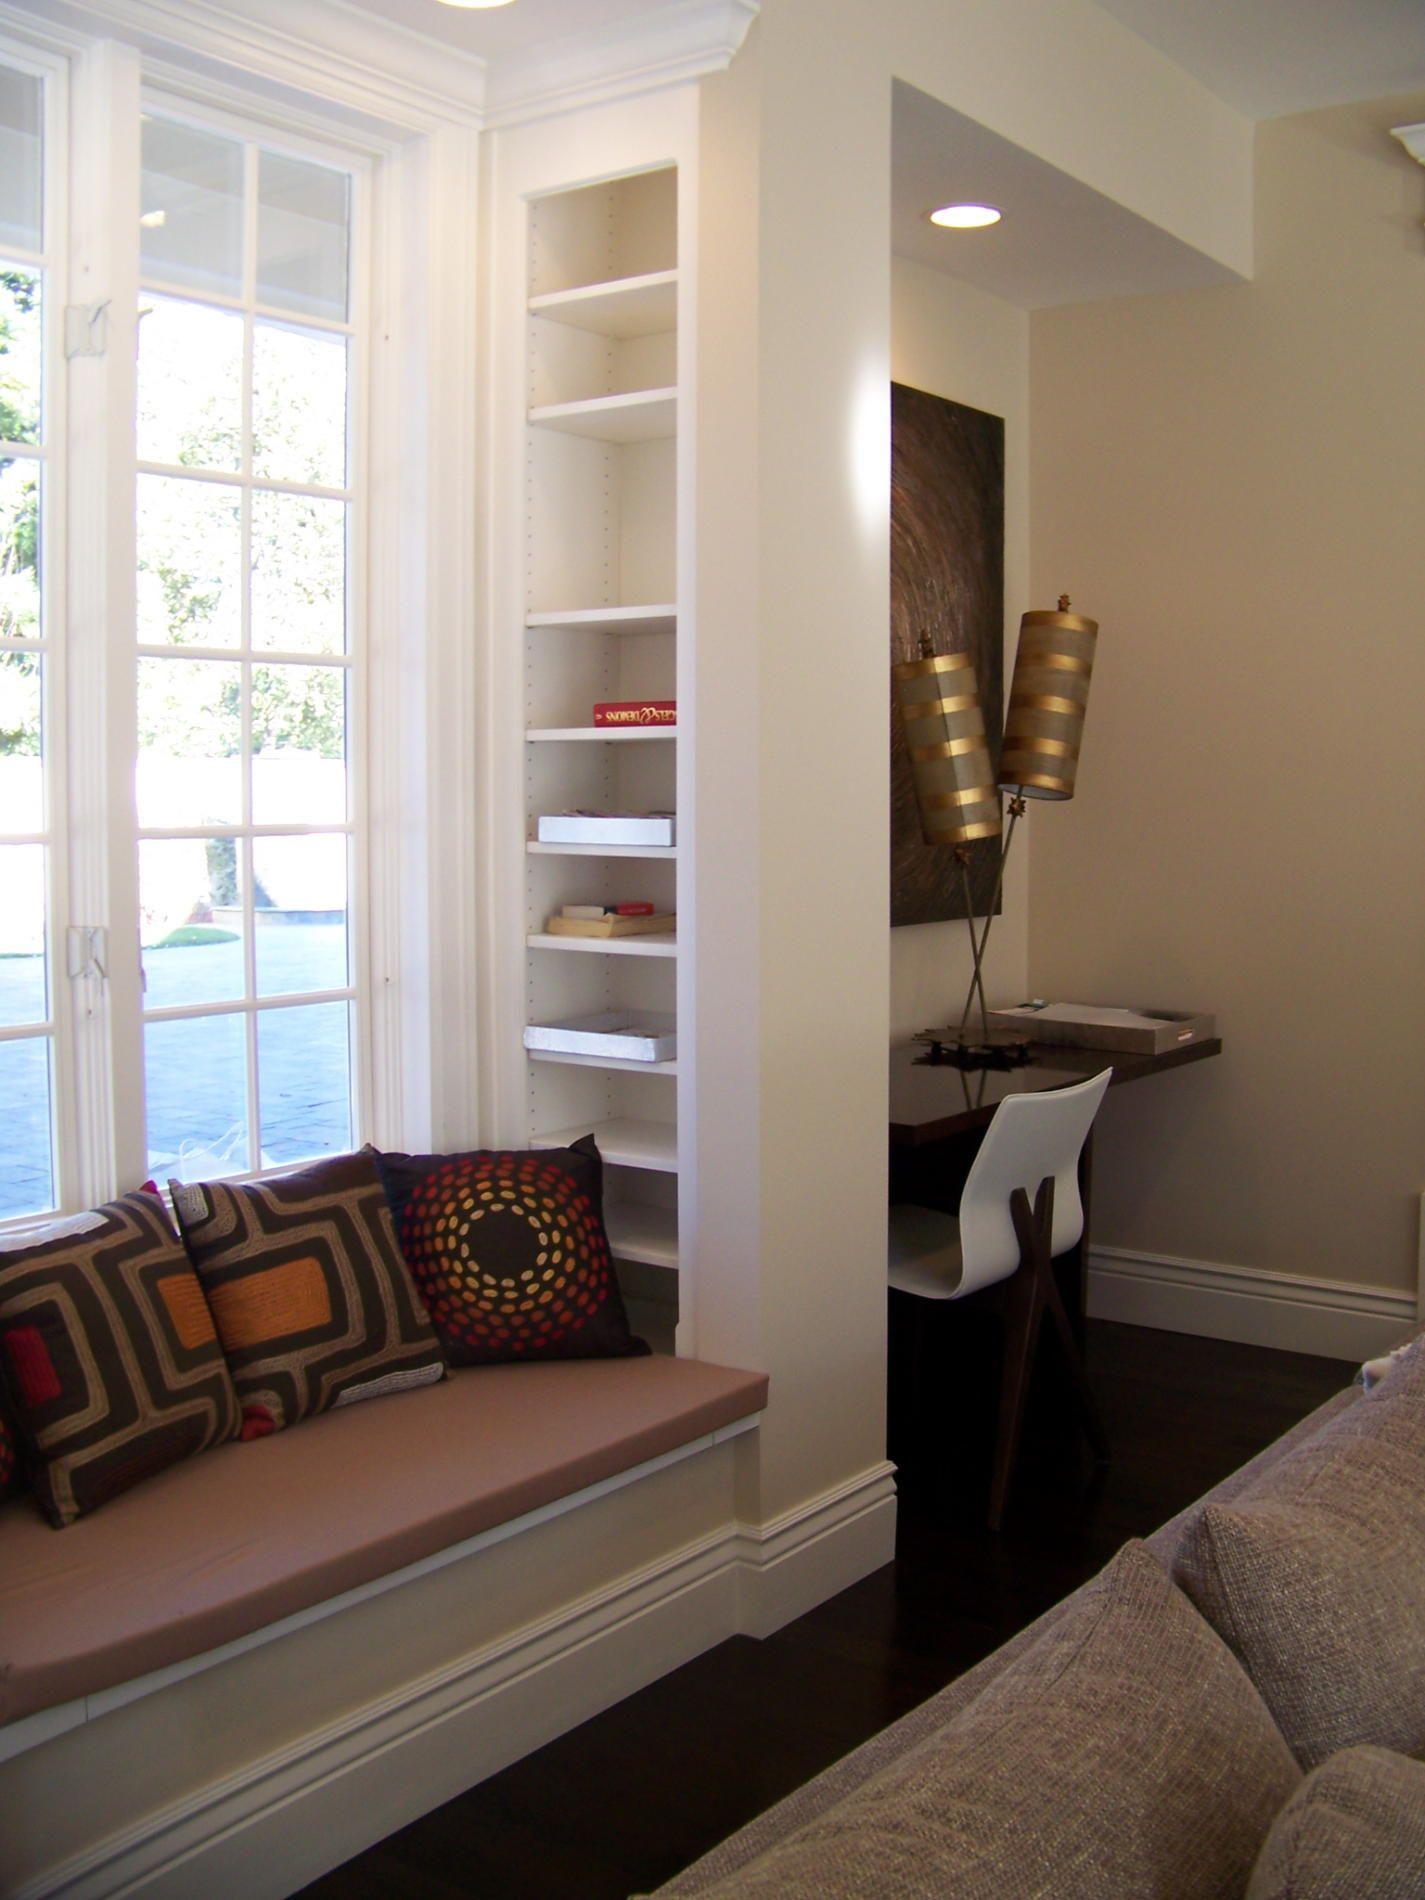 Sensational Interior Design Interior Living Room Lovely Low Bay Window Machost Co Dining Chair Design Ideas Machostcouk